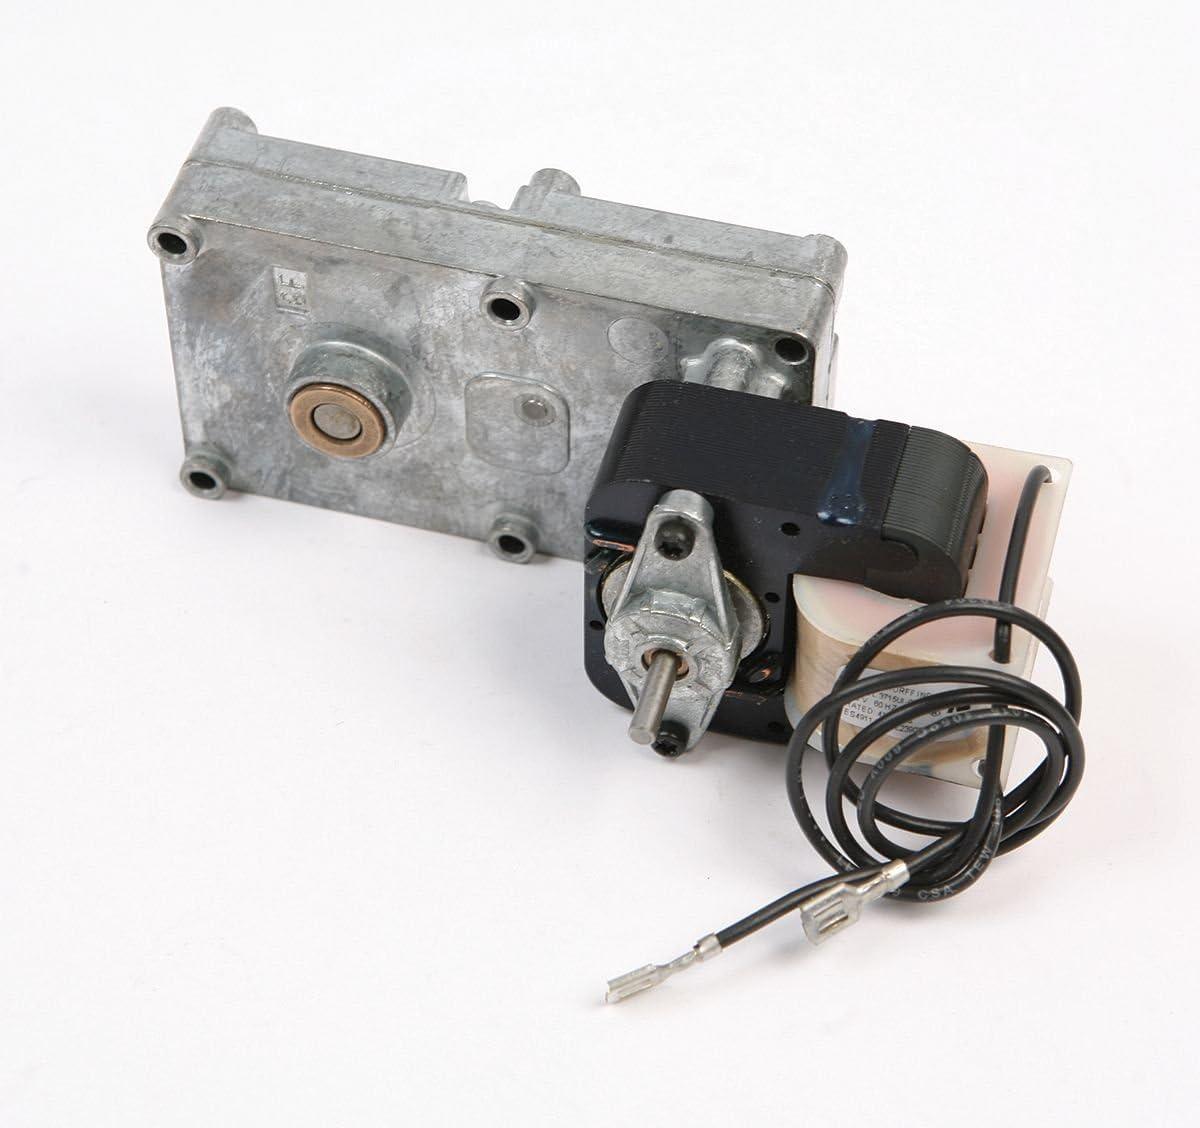 120-volt Apw Wyott 21721551 Display Motor